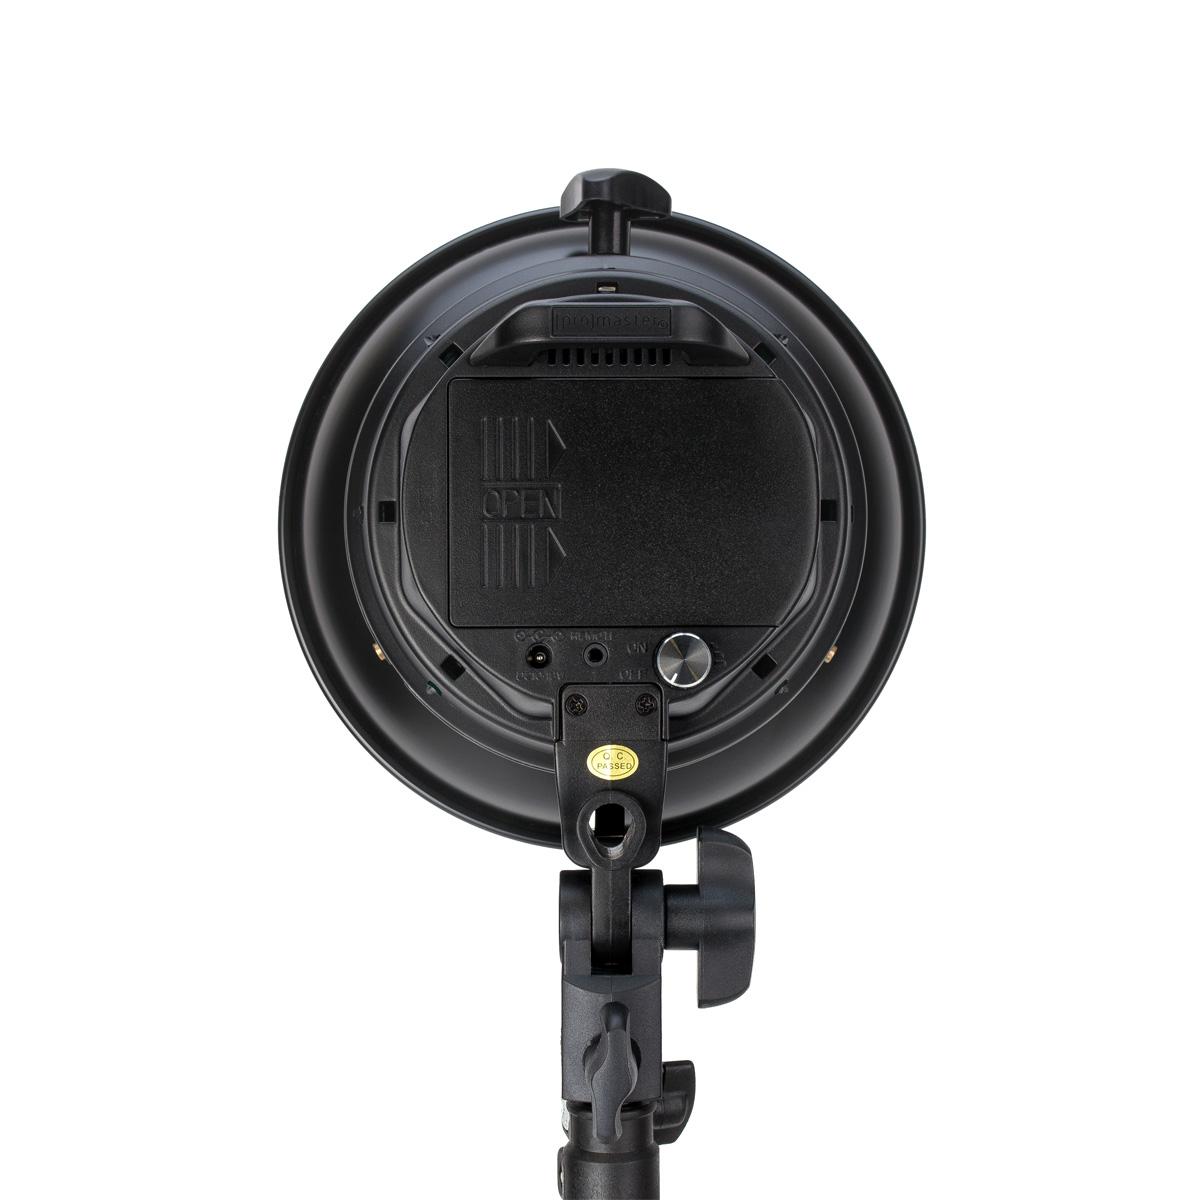 Studio Lighting Rental: Promaster VL380 3-Light Portable LED Studio Kit